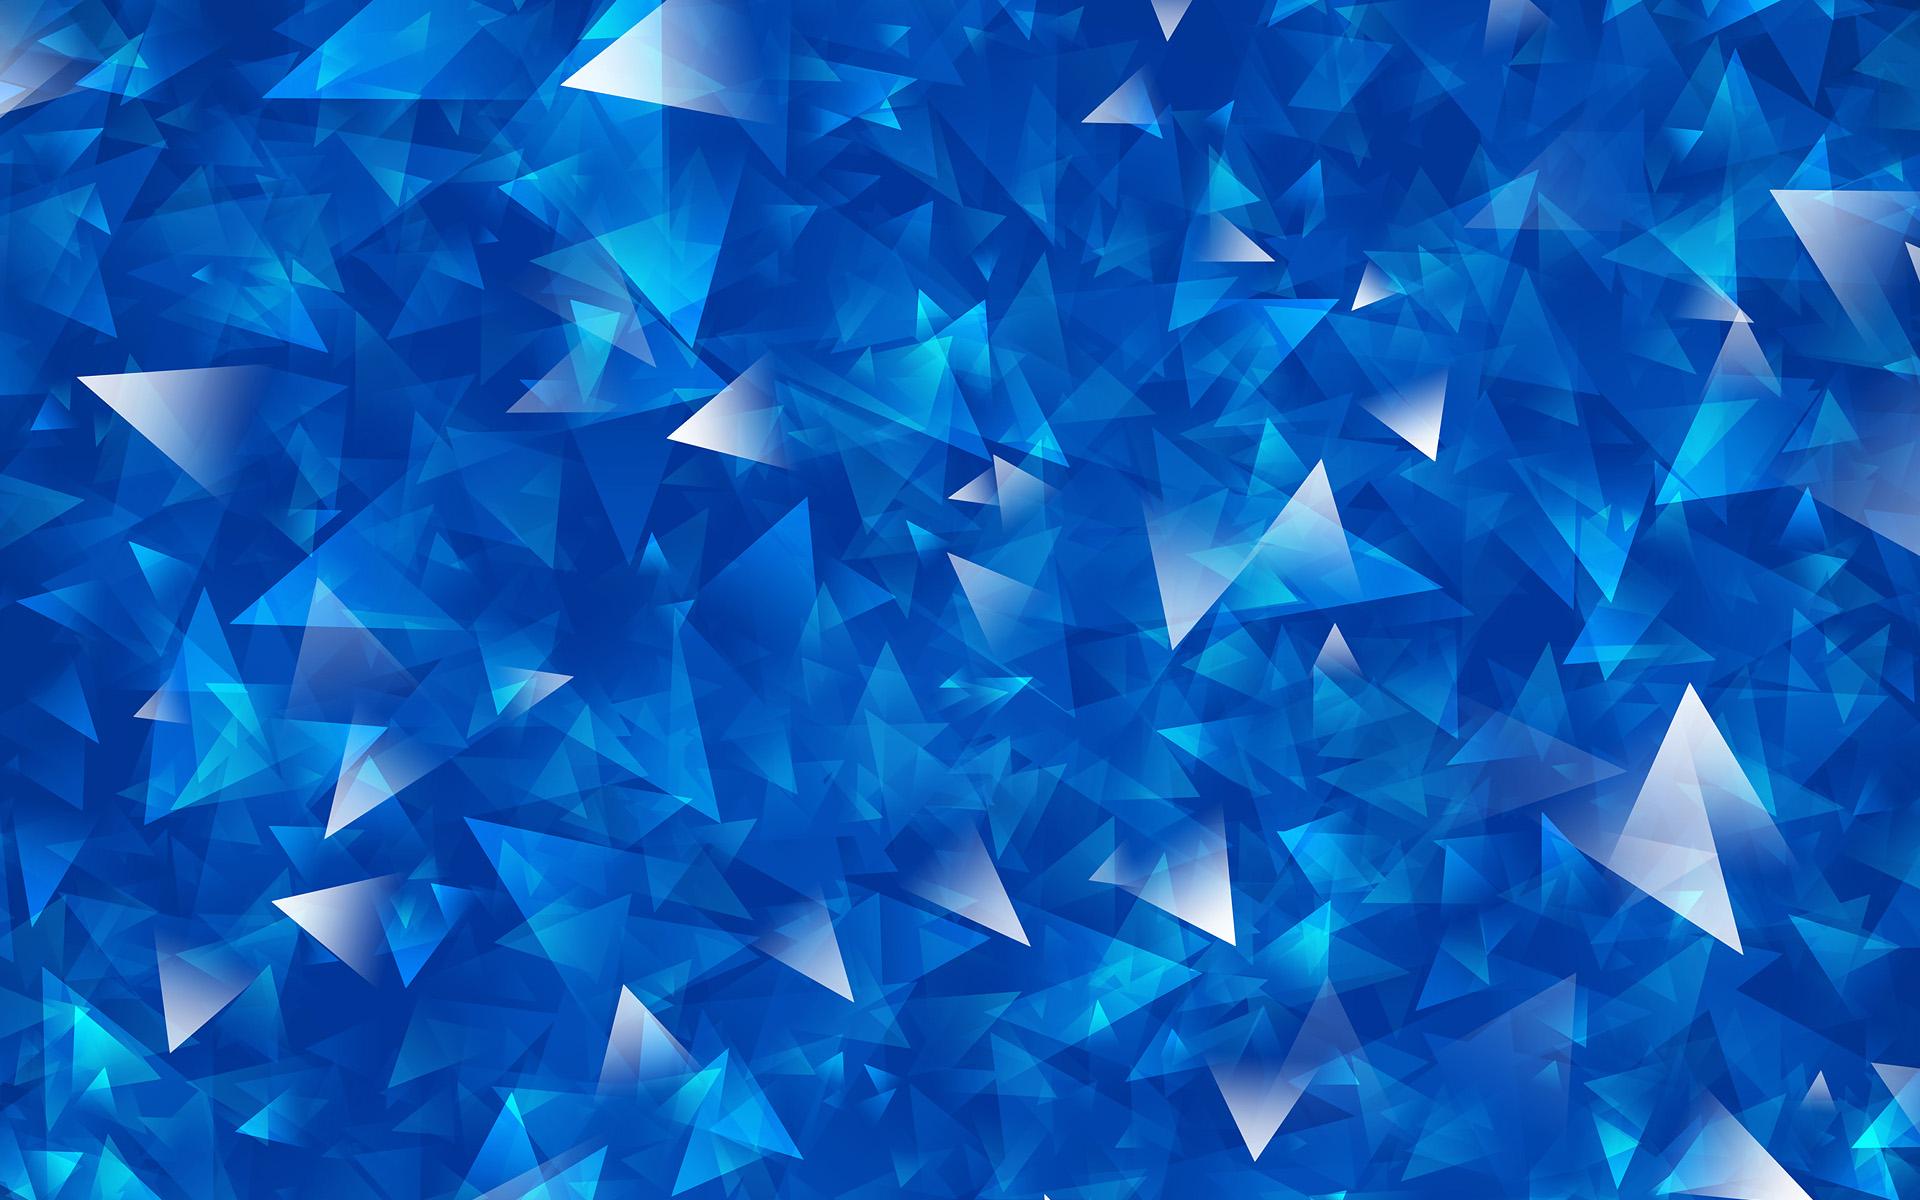 3d Flower Wallpapers For Iphone Blue Wallpaper 46 1920x1200